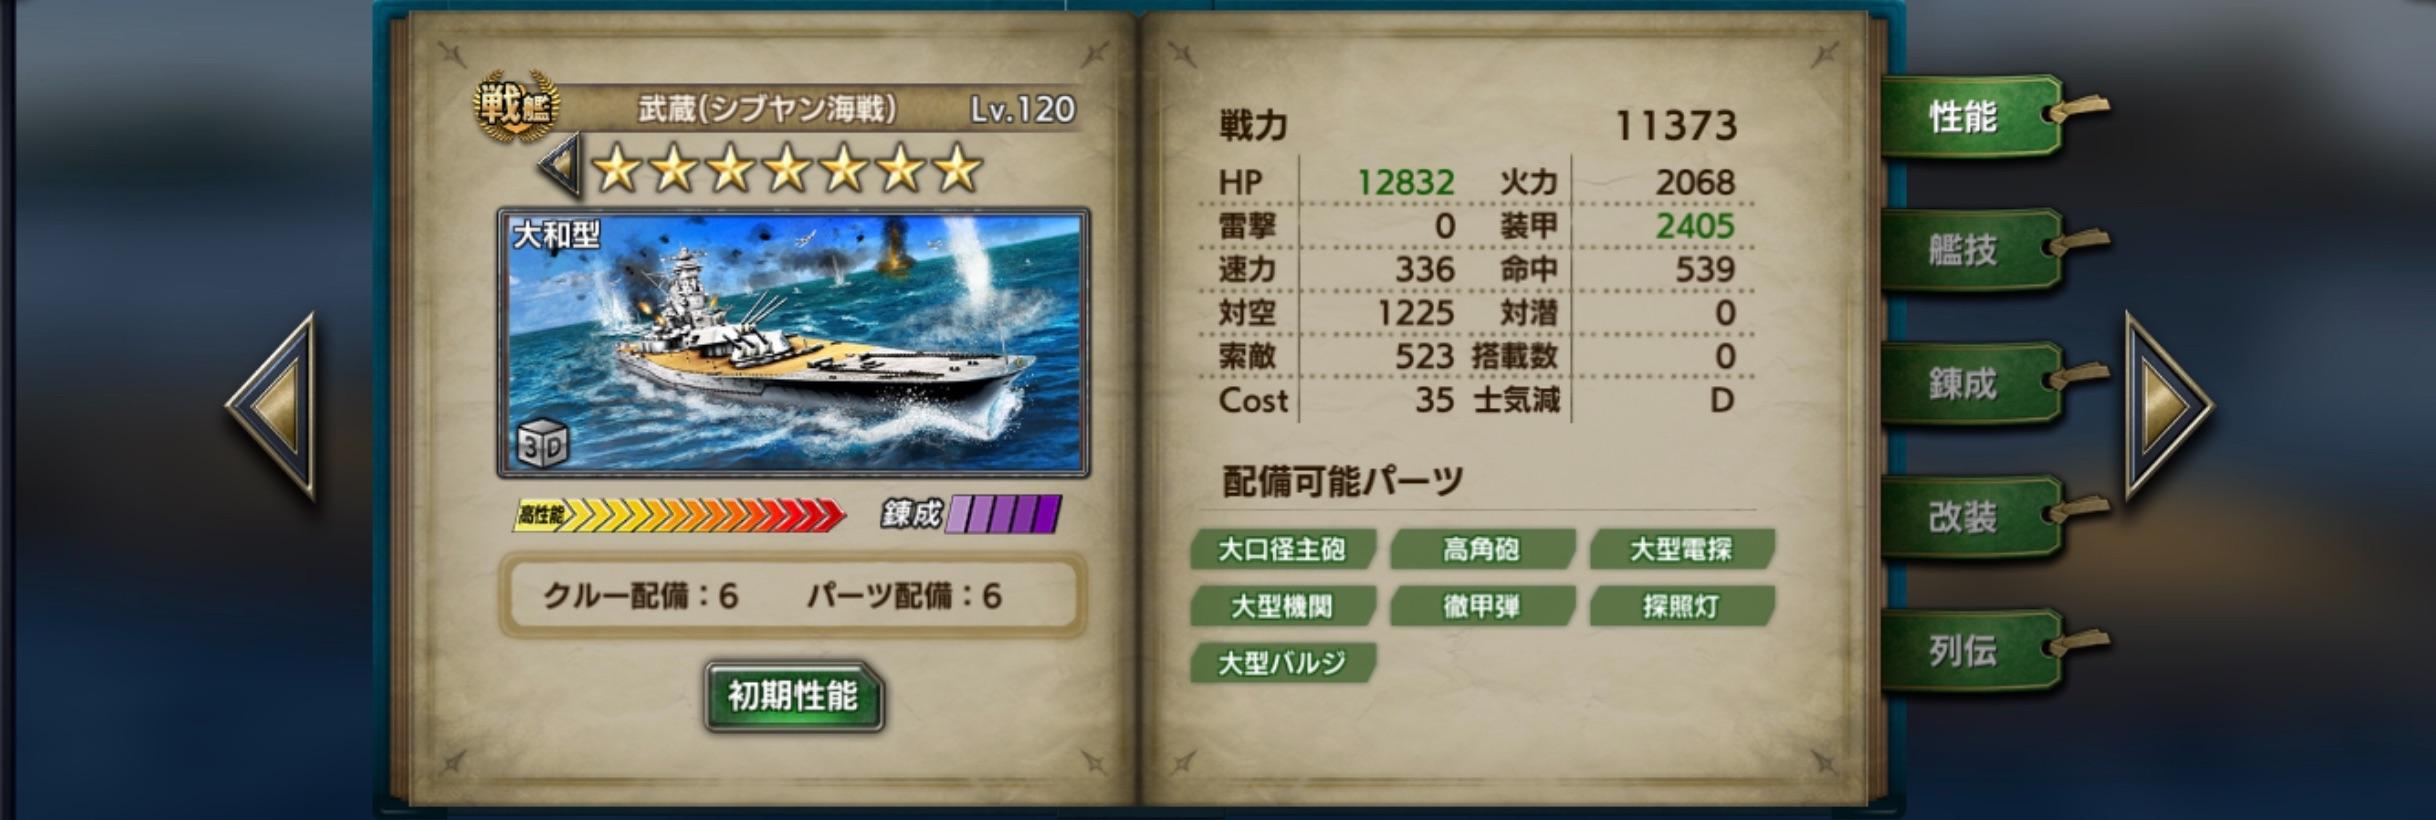 MusashiS-performance